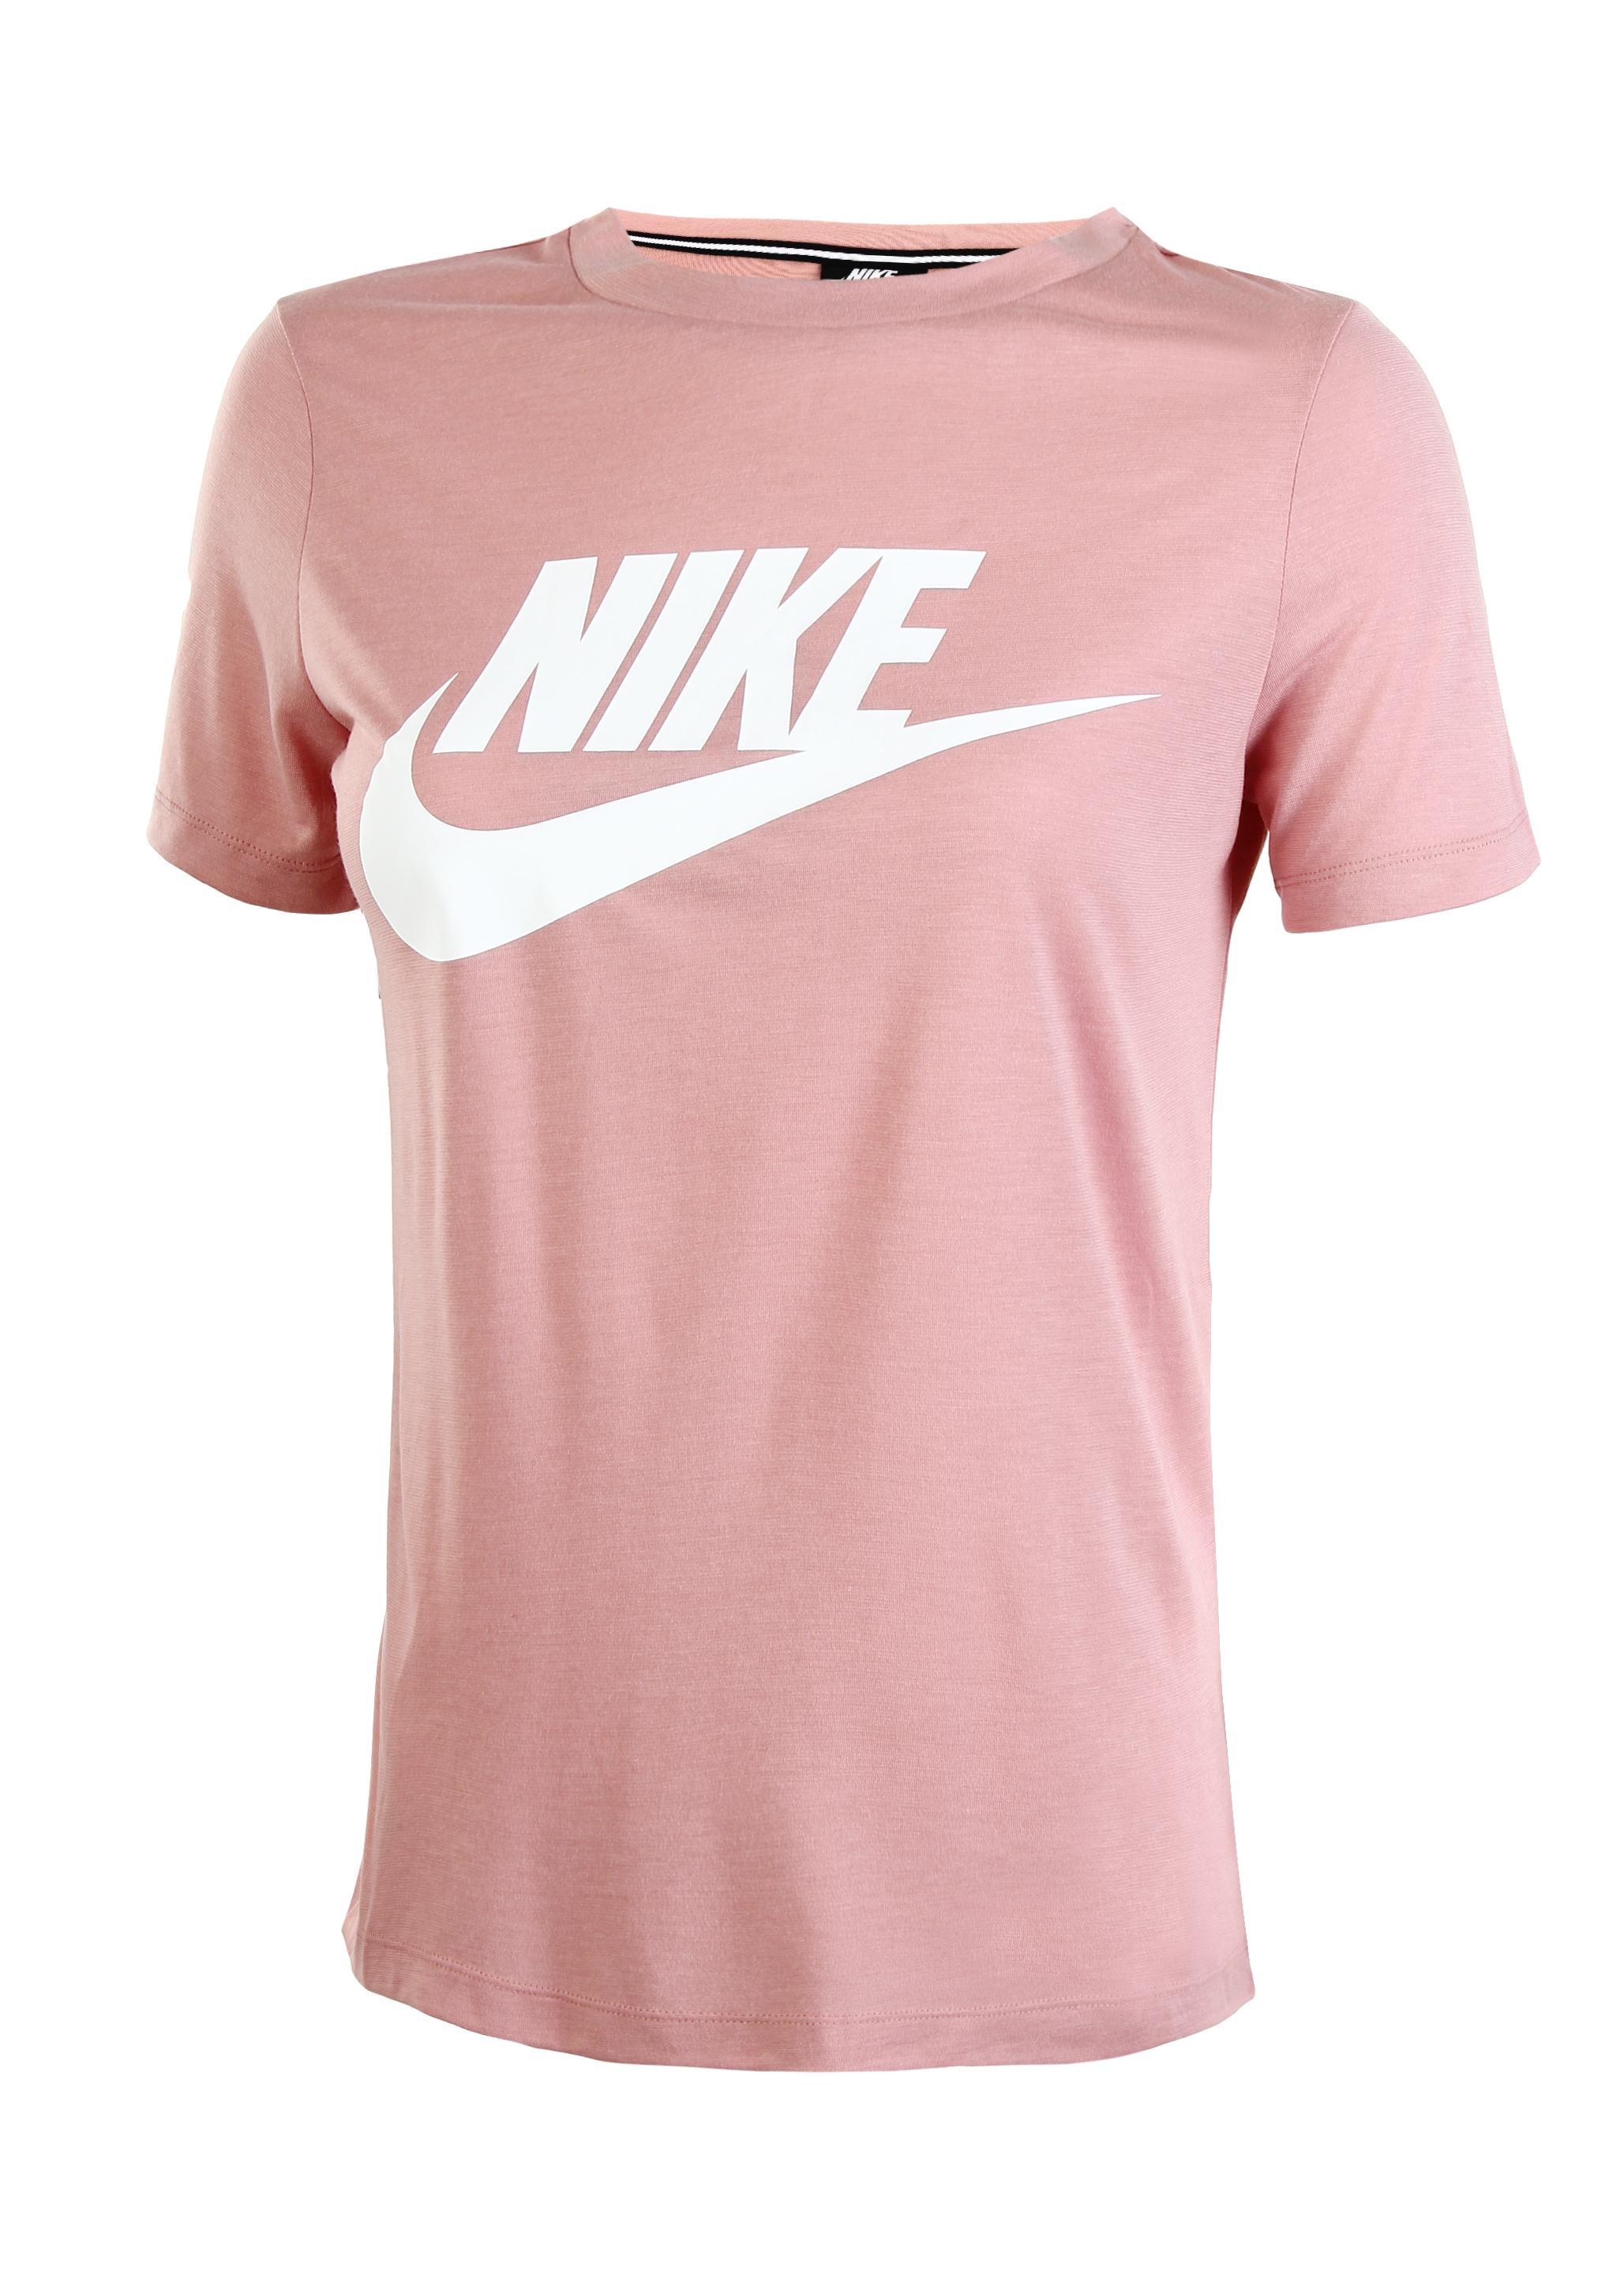 a641dfc2 Футболка женская Nike Sportswear Essential T-Shirt - Сеть спортивных ...